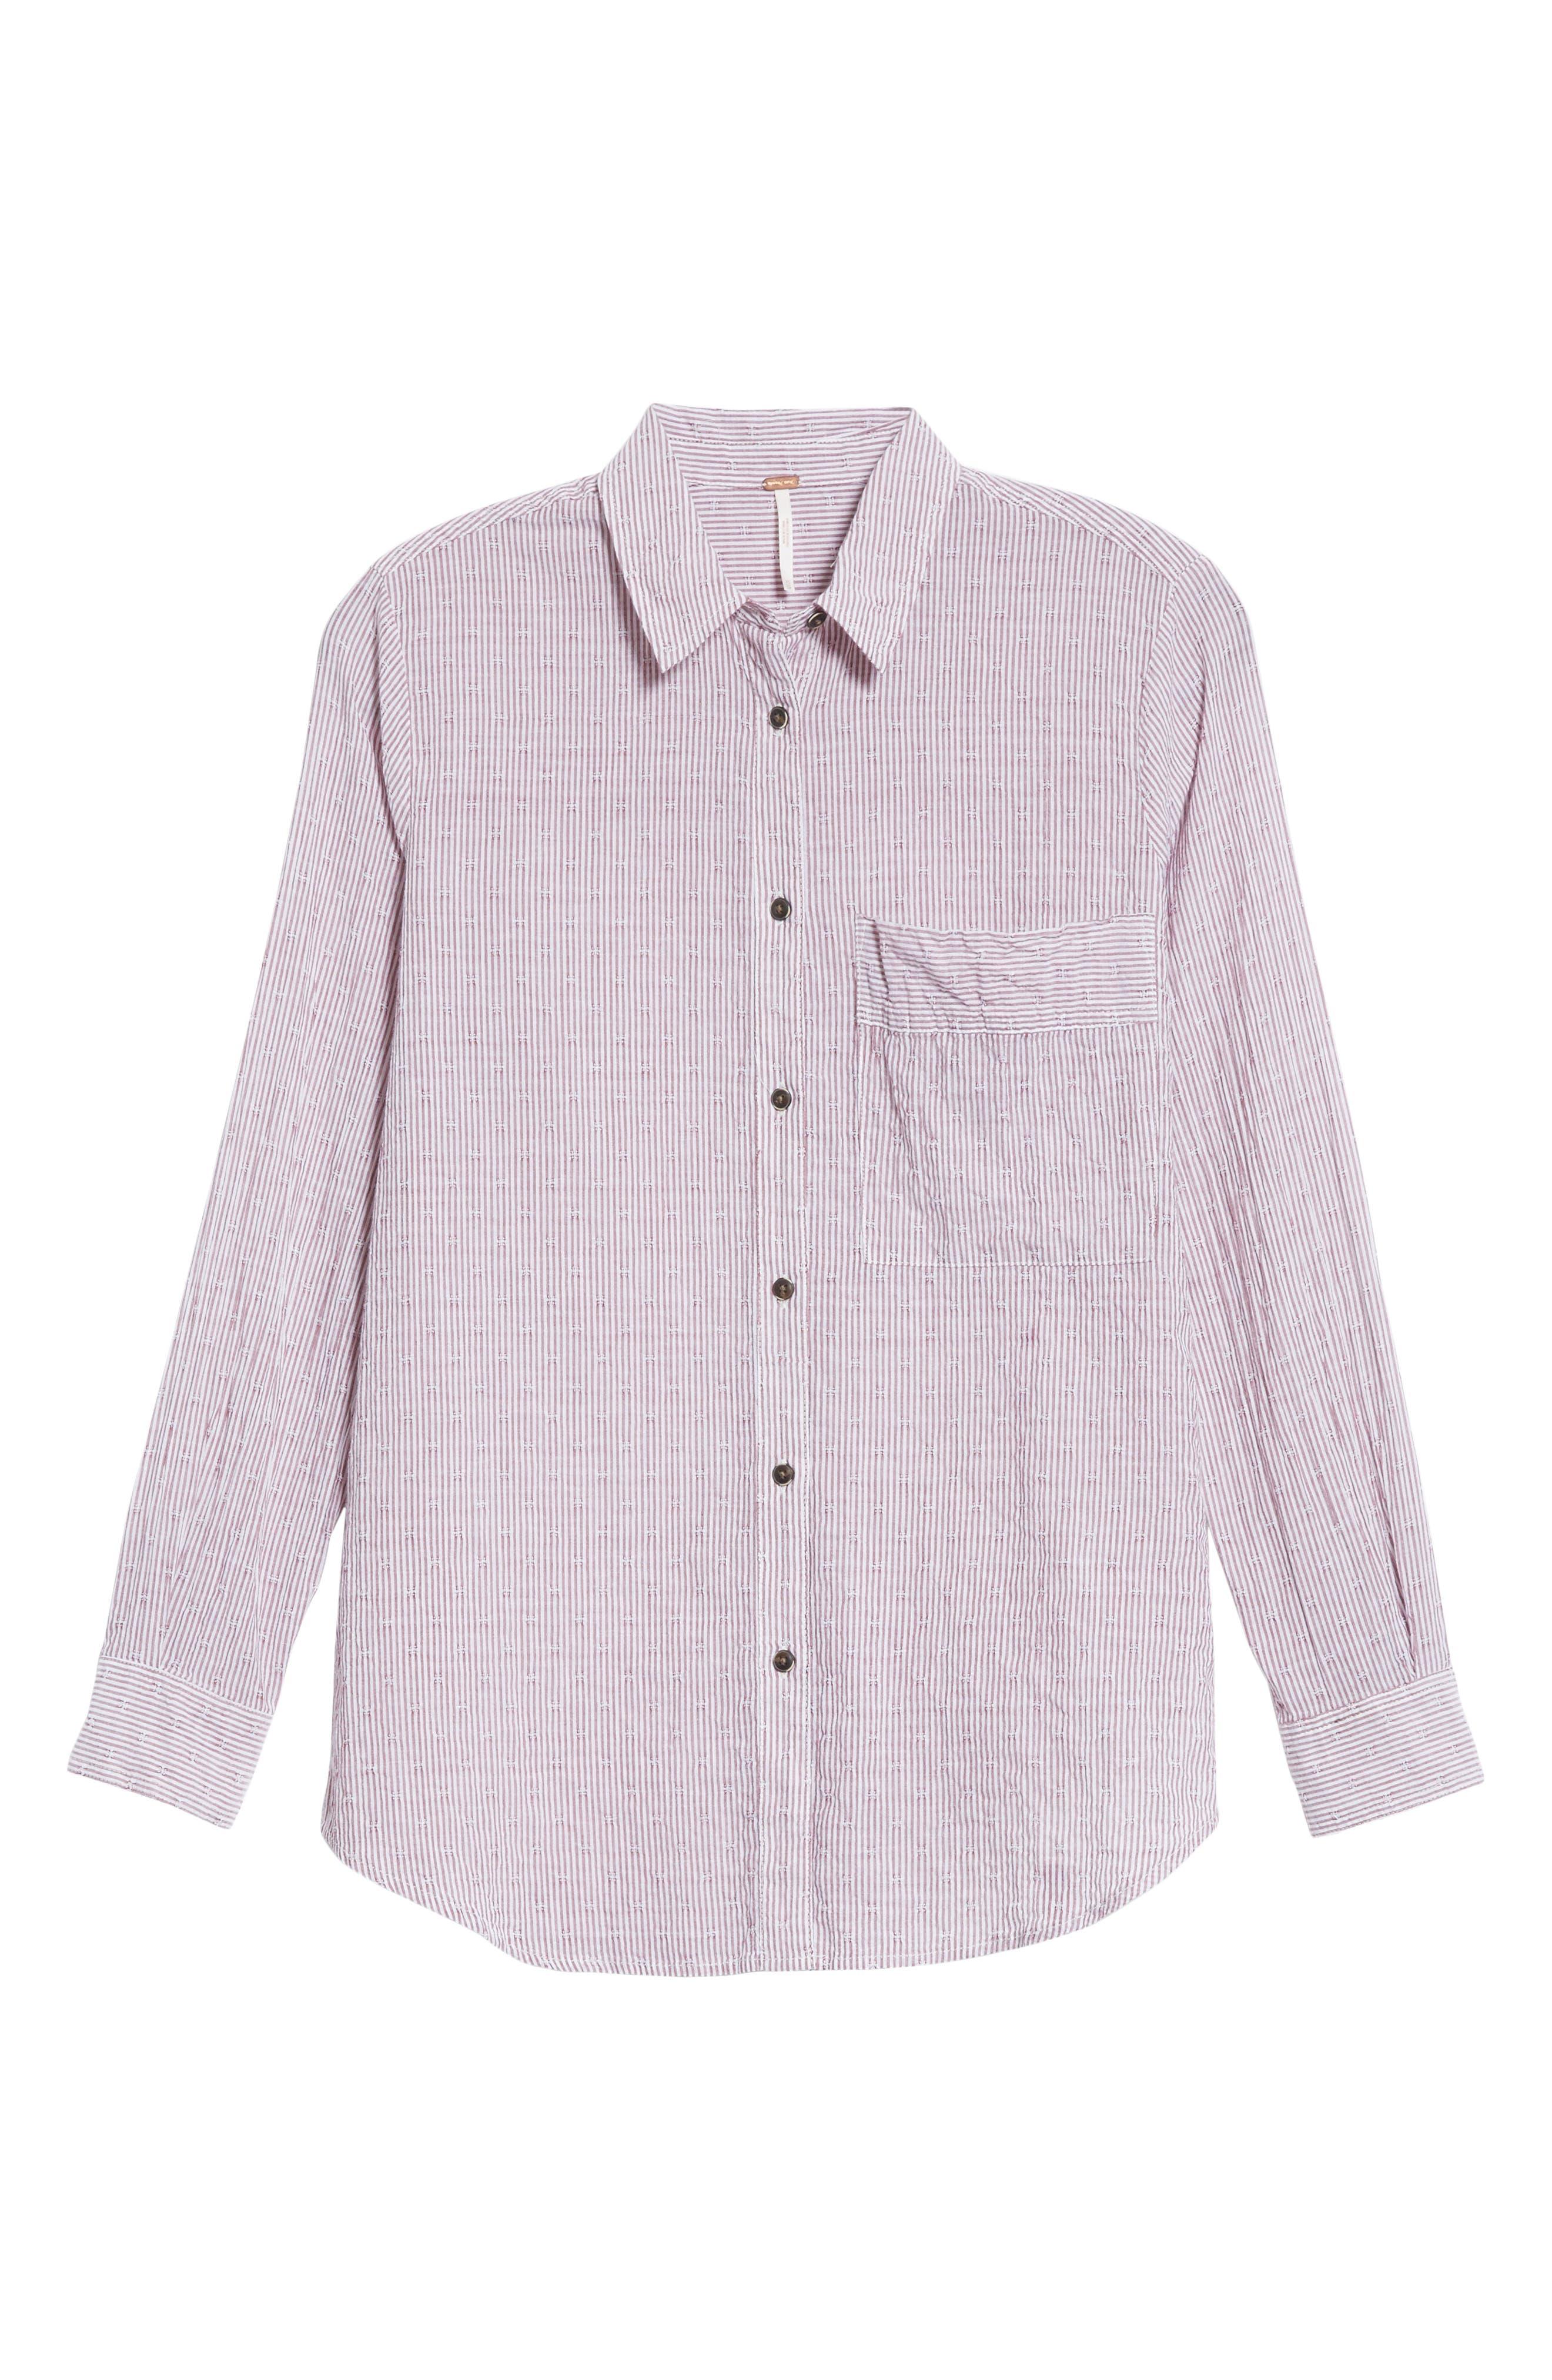 No Limits Stripe Stretch Cotton Shirt,                             Alternate thumbnail 12, color,